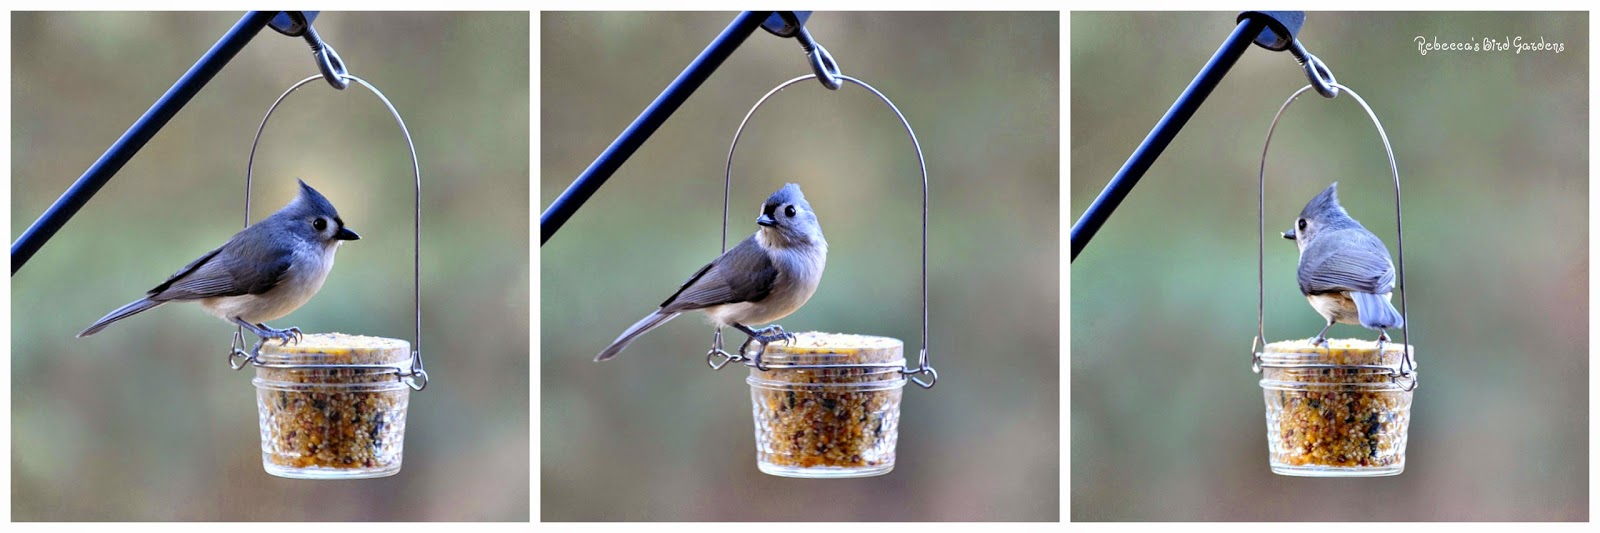 Rebecca 39 s bird gardens blog diy mason or jelly jar for How to make suet balls for bird feeders